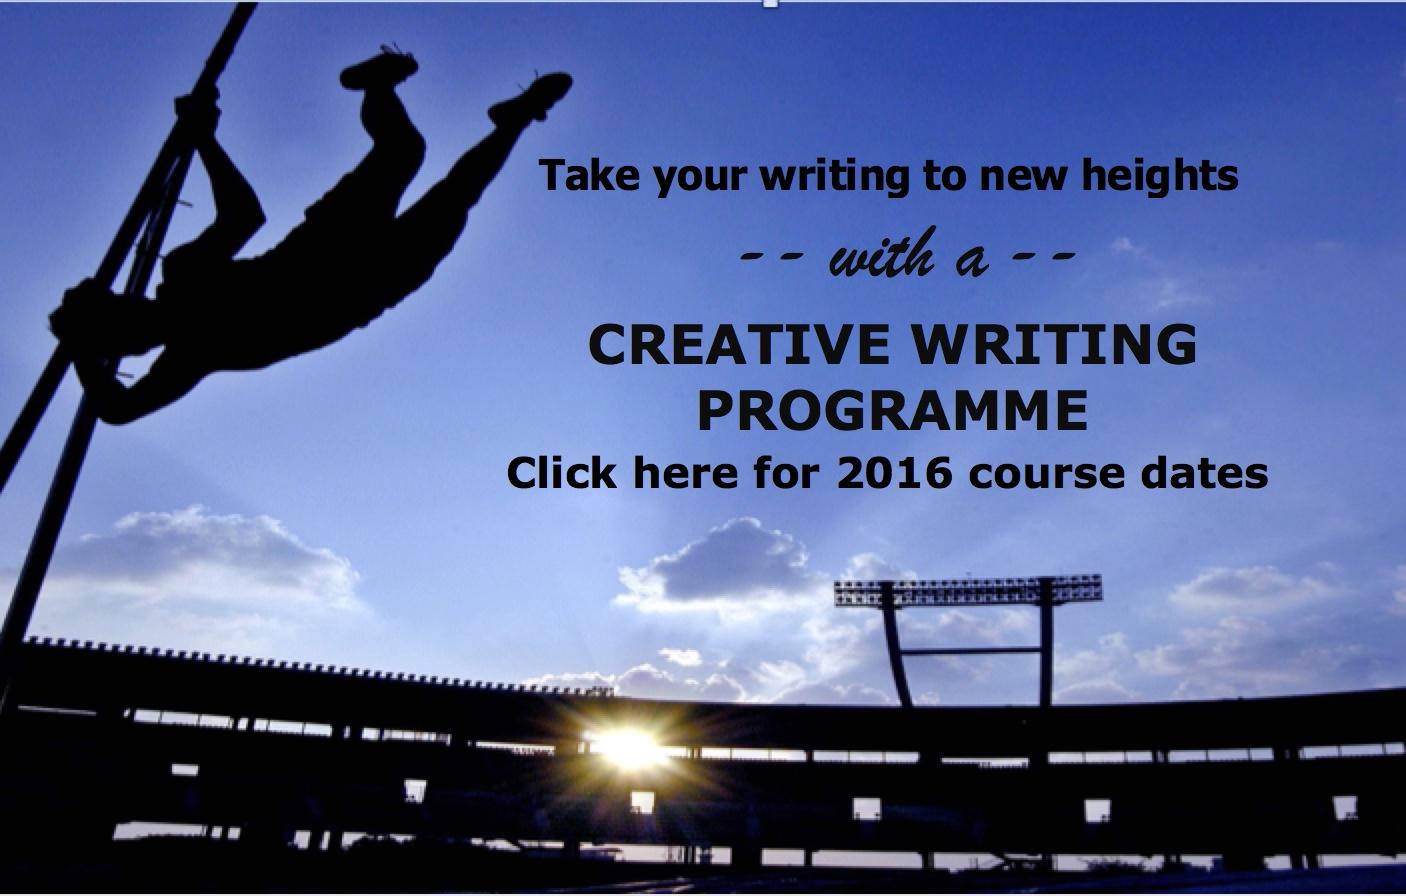 creative writing courses dublin Many graduates of the mfa in creative writing establish  courses will remain open until ahecs/gti ireland gti ireland, 14-16 lord edward street, dublin.